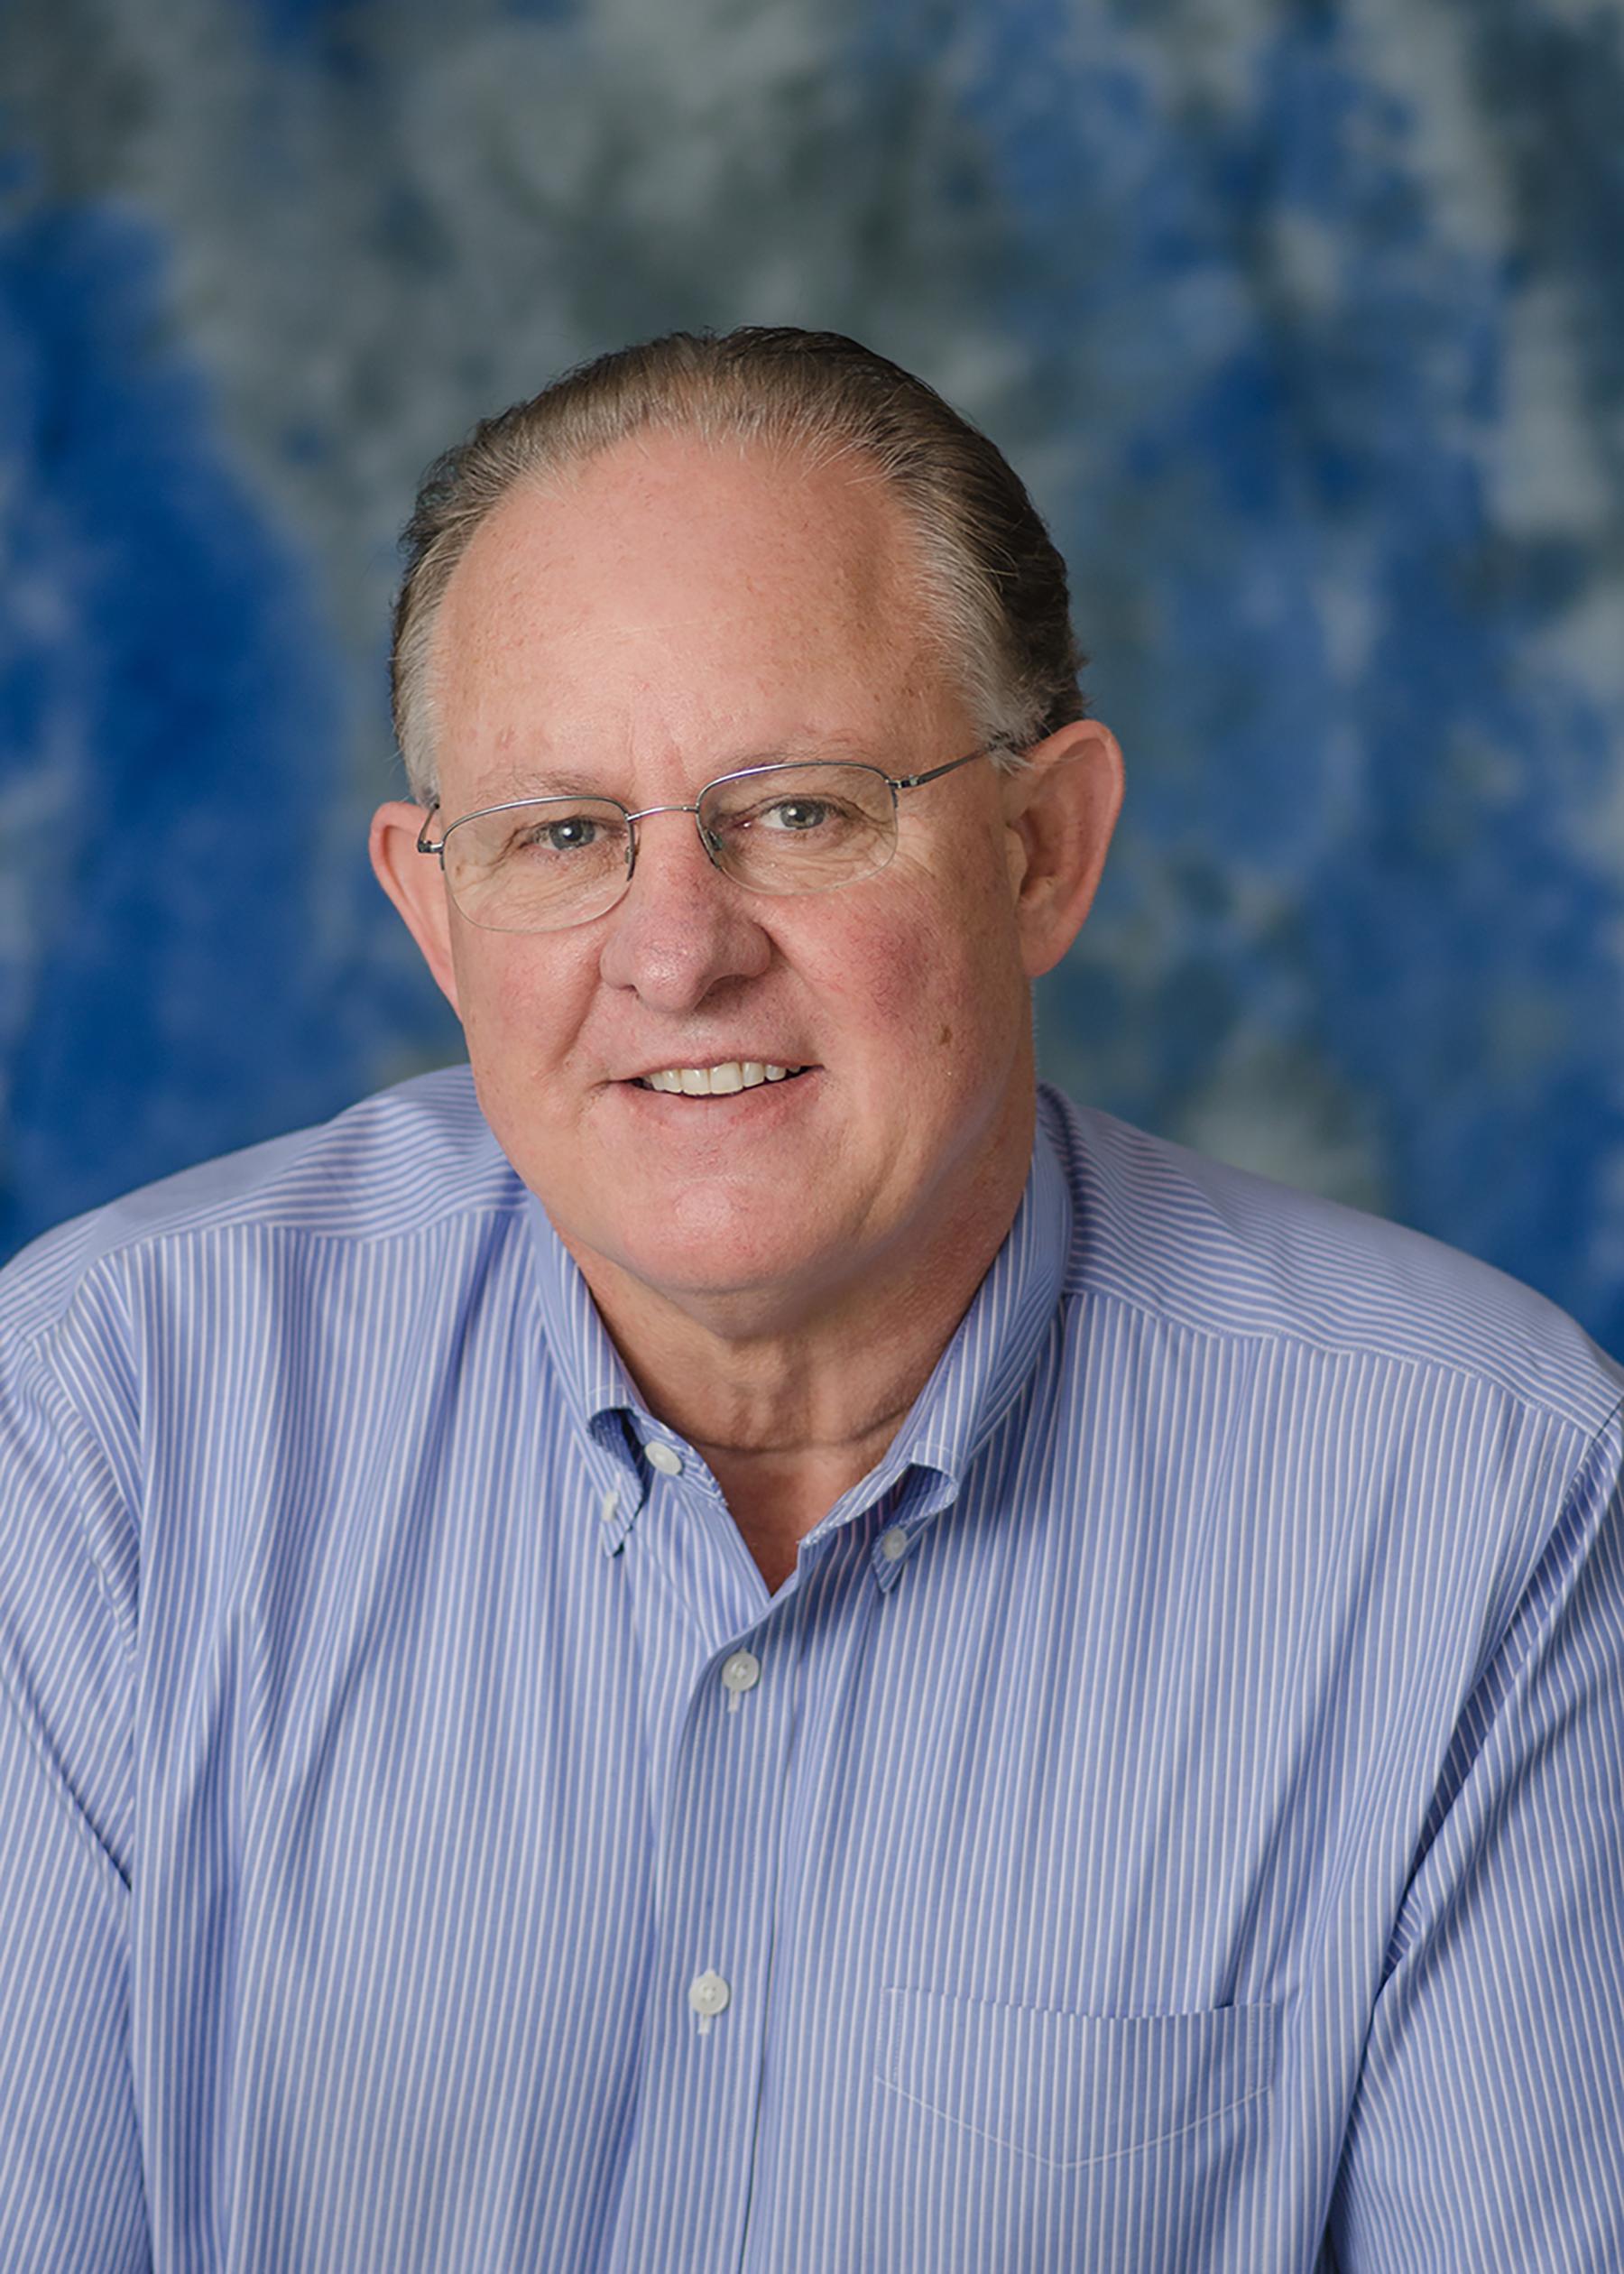 Kennesaw GA executive headshot